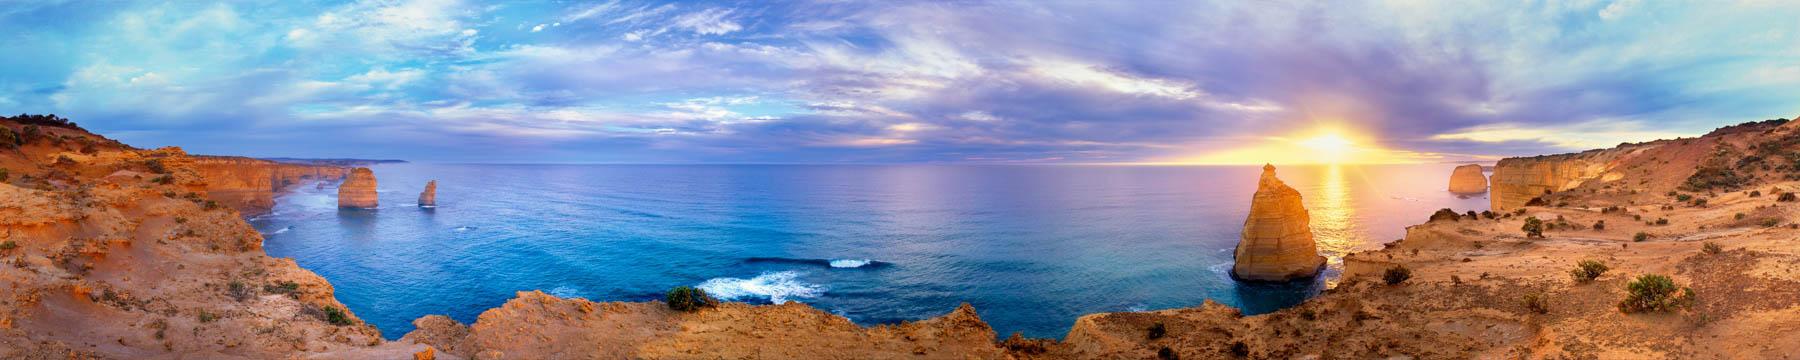 A 240 degree view of The Twelve Apostles at sunset, Vicroria, Australia.